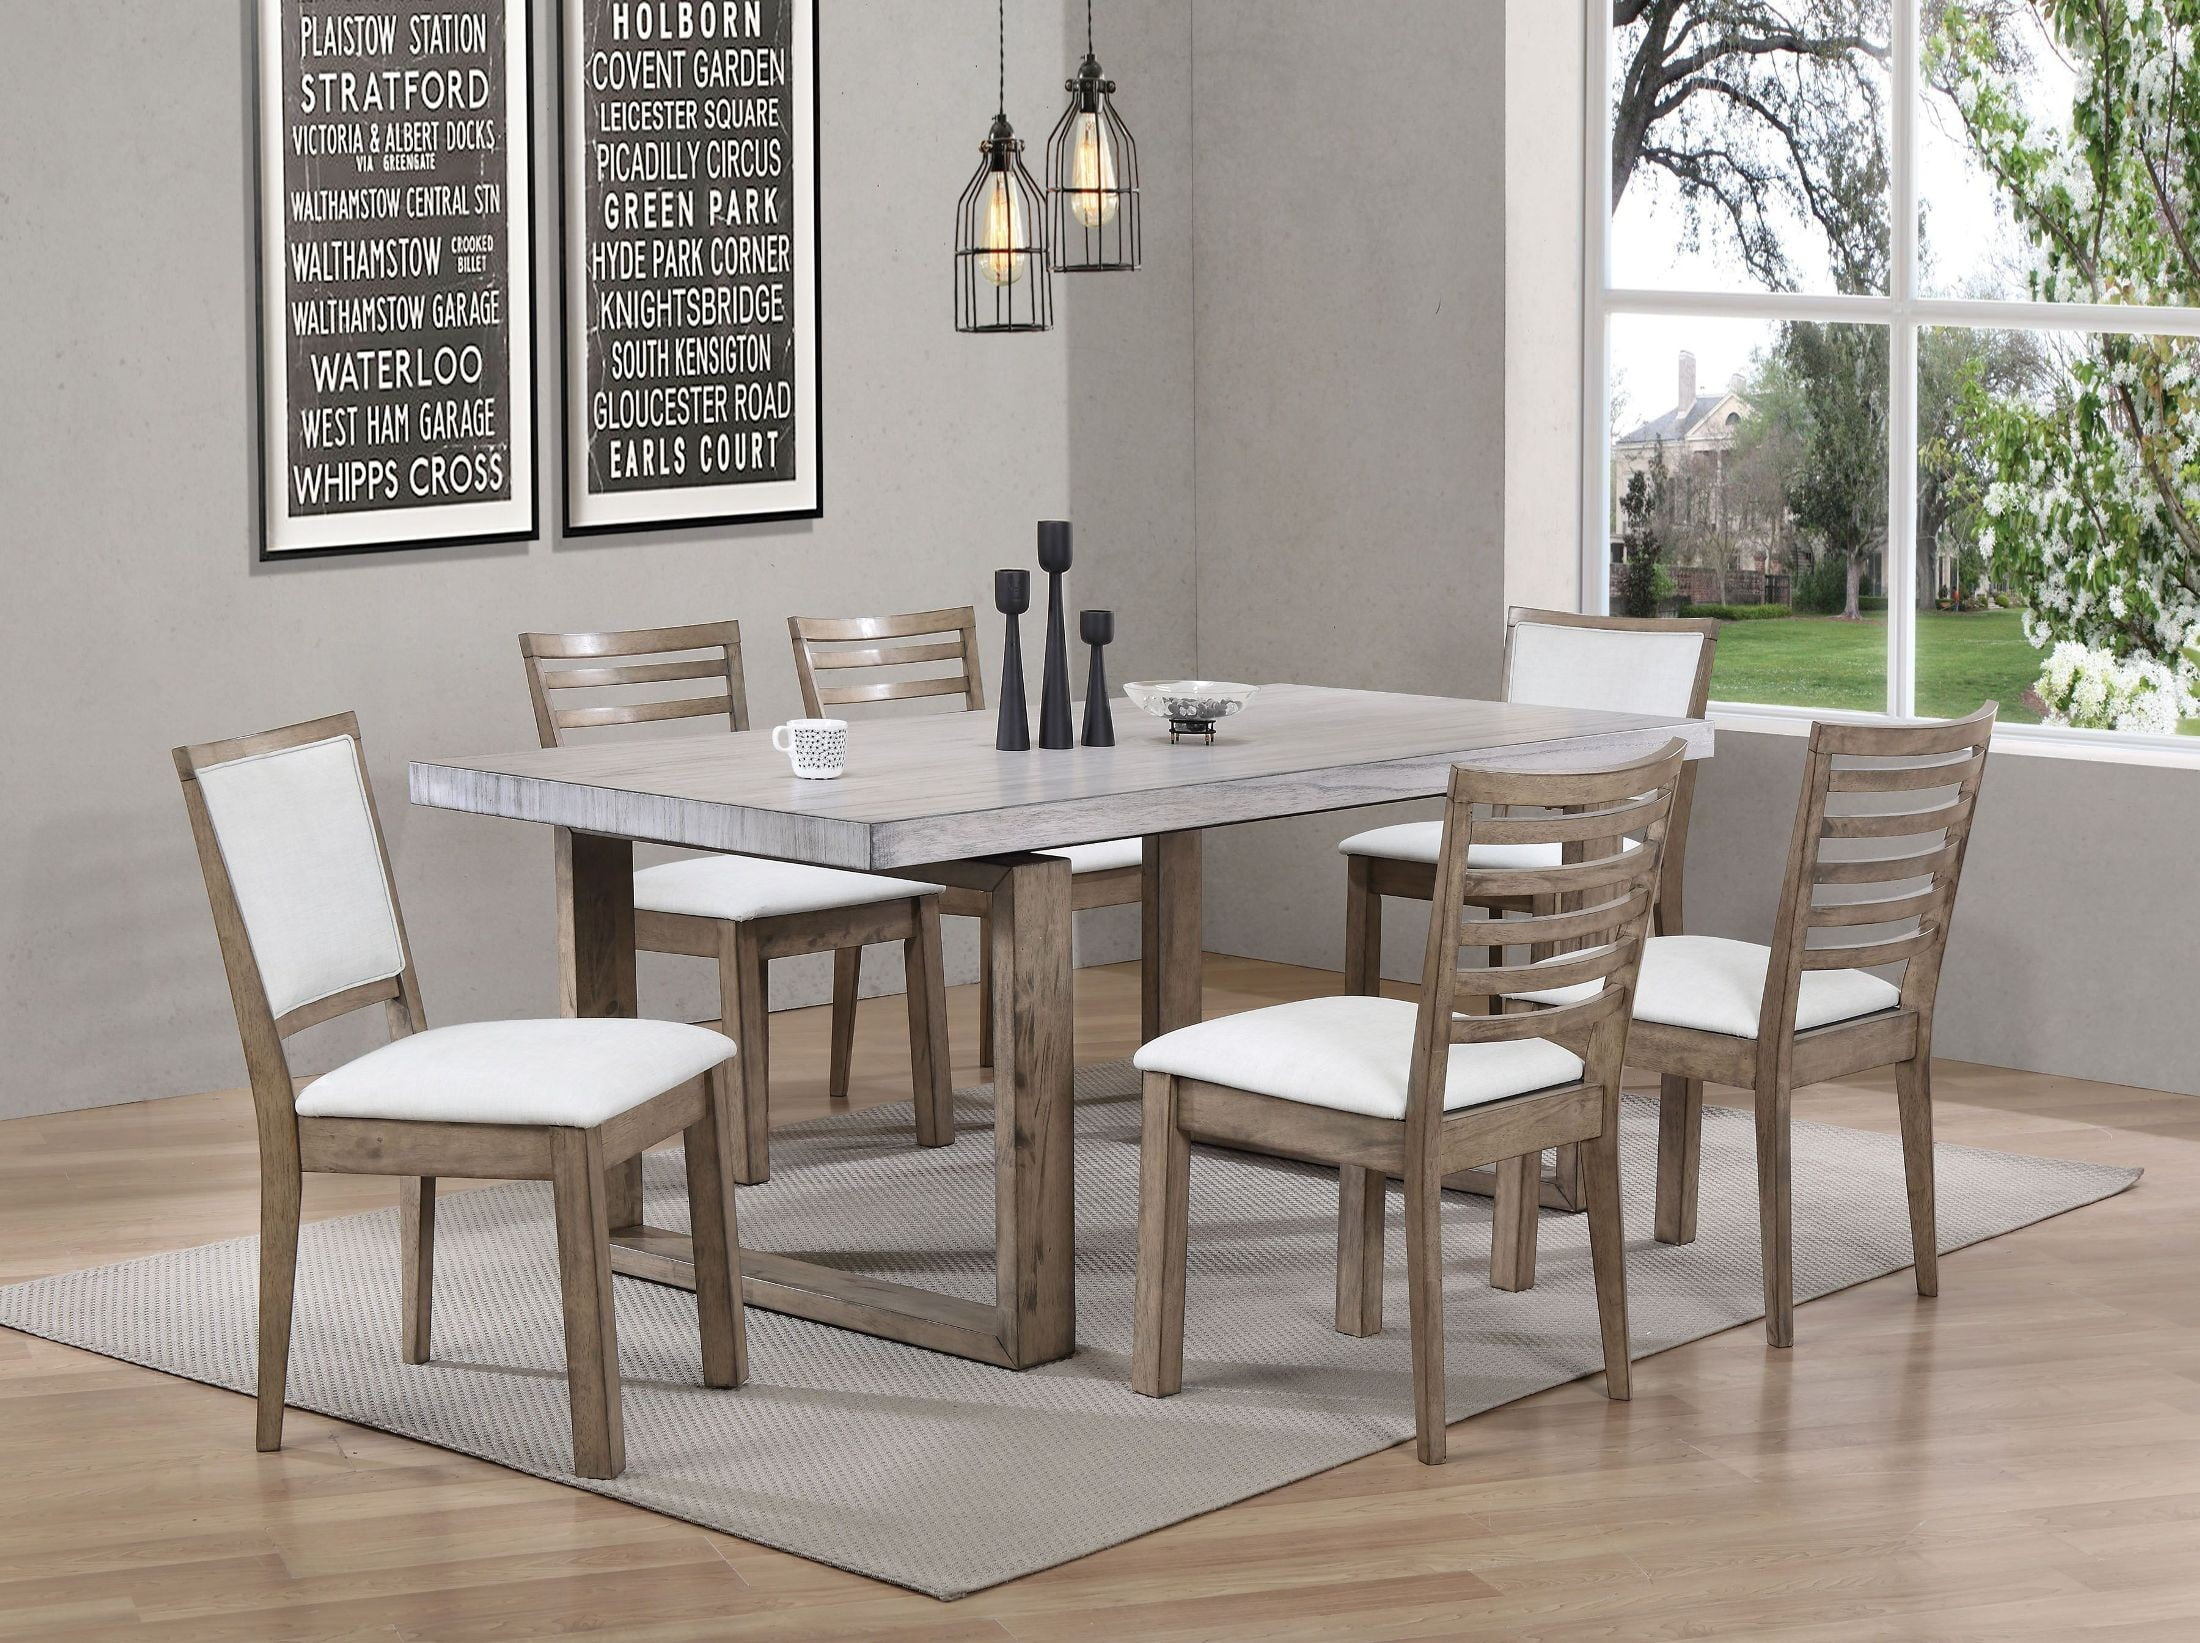 Paulina light gray and rustic oak dining room set from acme paulina light gray and rustic oak dining room set dzzzfo